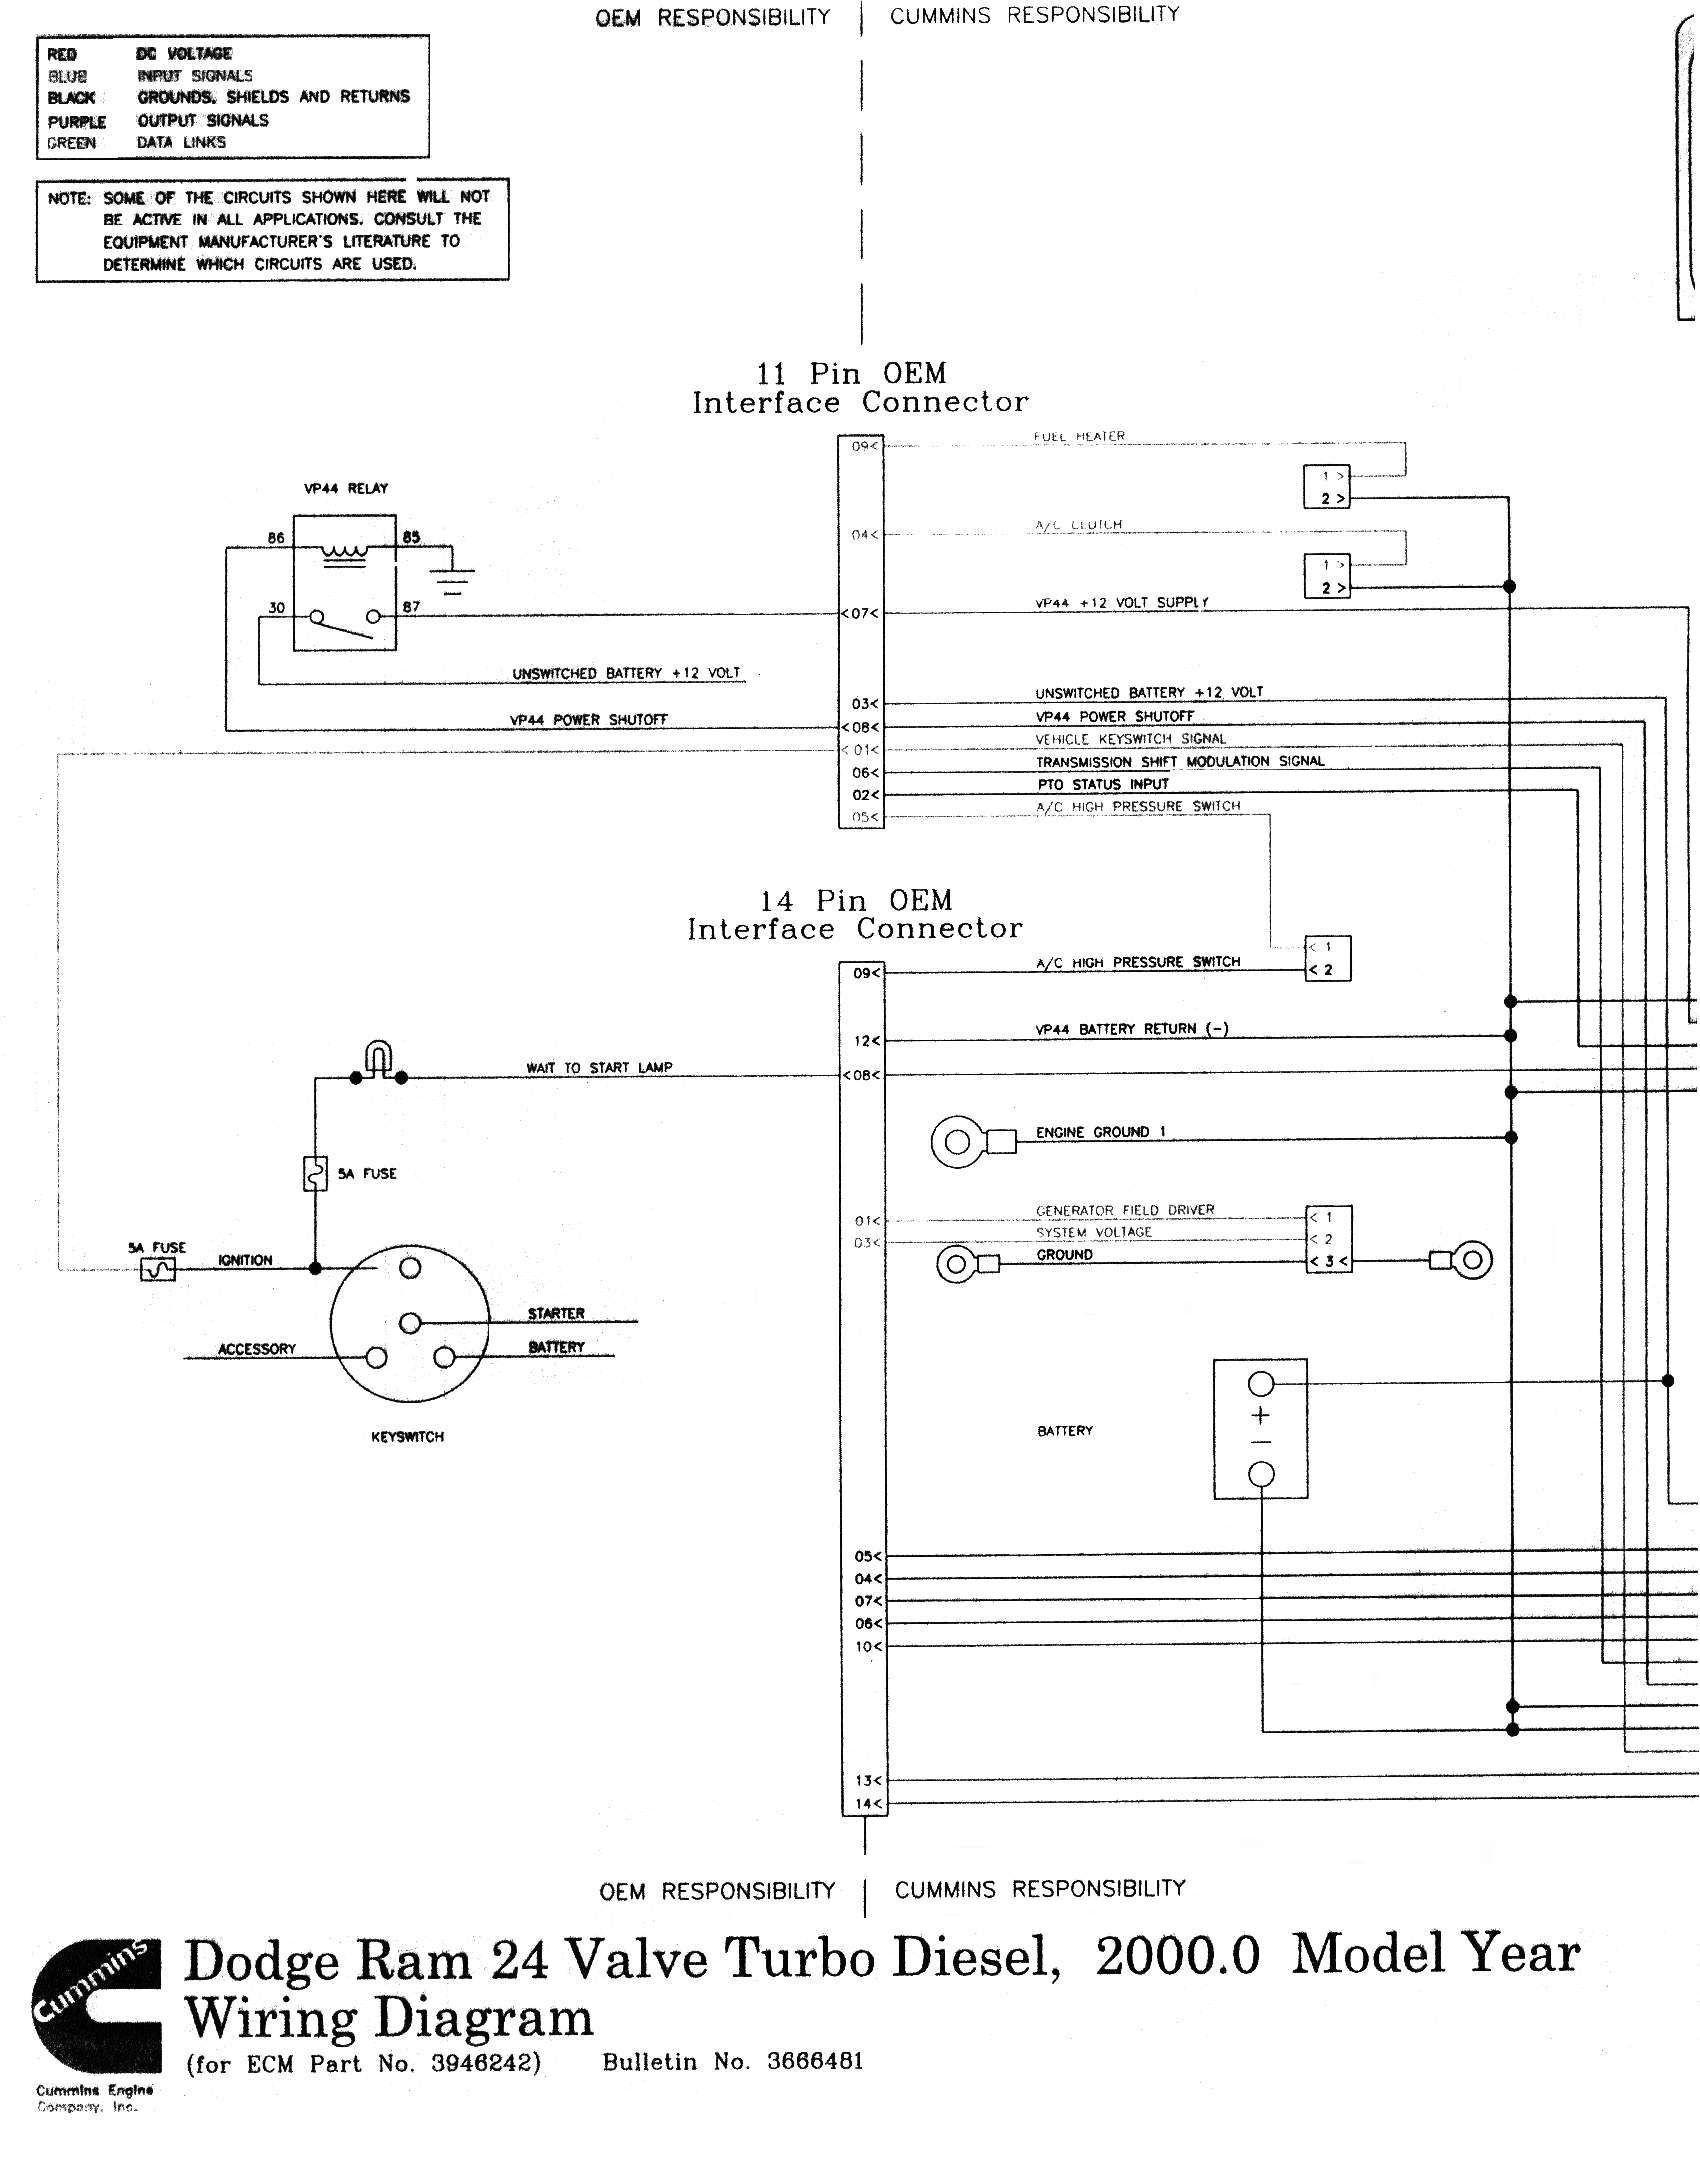 Cummins Diesel Engine Diagram Dodge Trucks Ram Dodge Ram Diesel Cummins